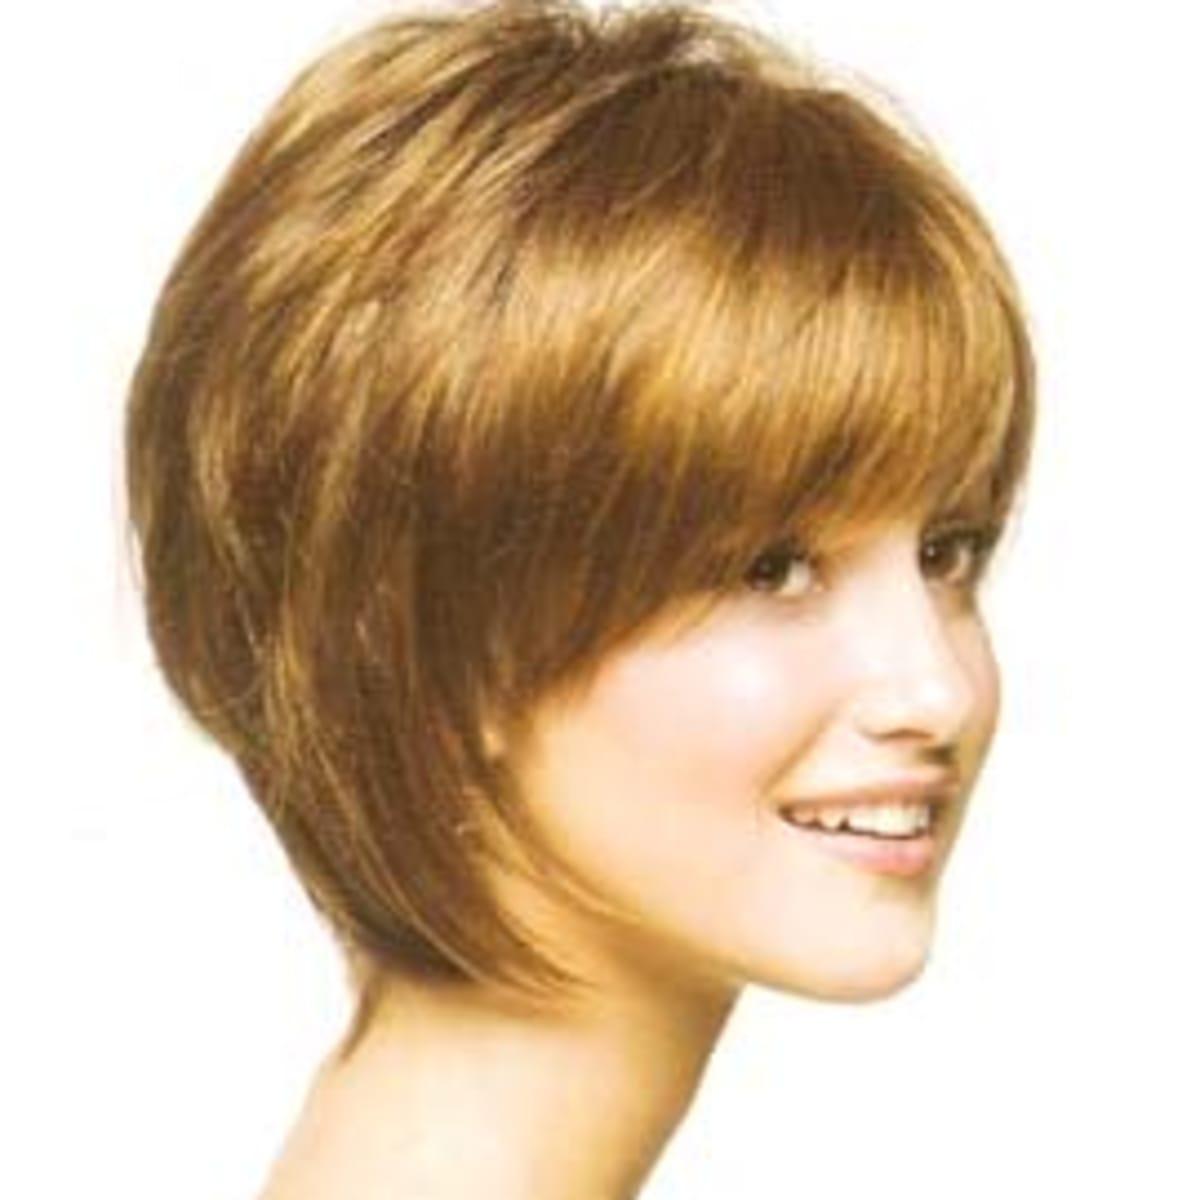 Haircuts Short Layered Hair Cuts And Hairstyles Bellatory Fashion And Beauty